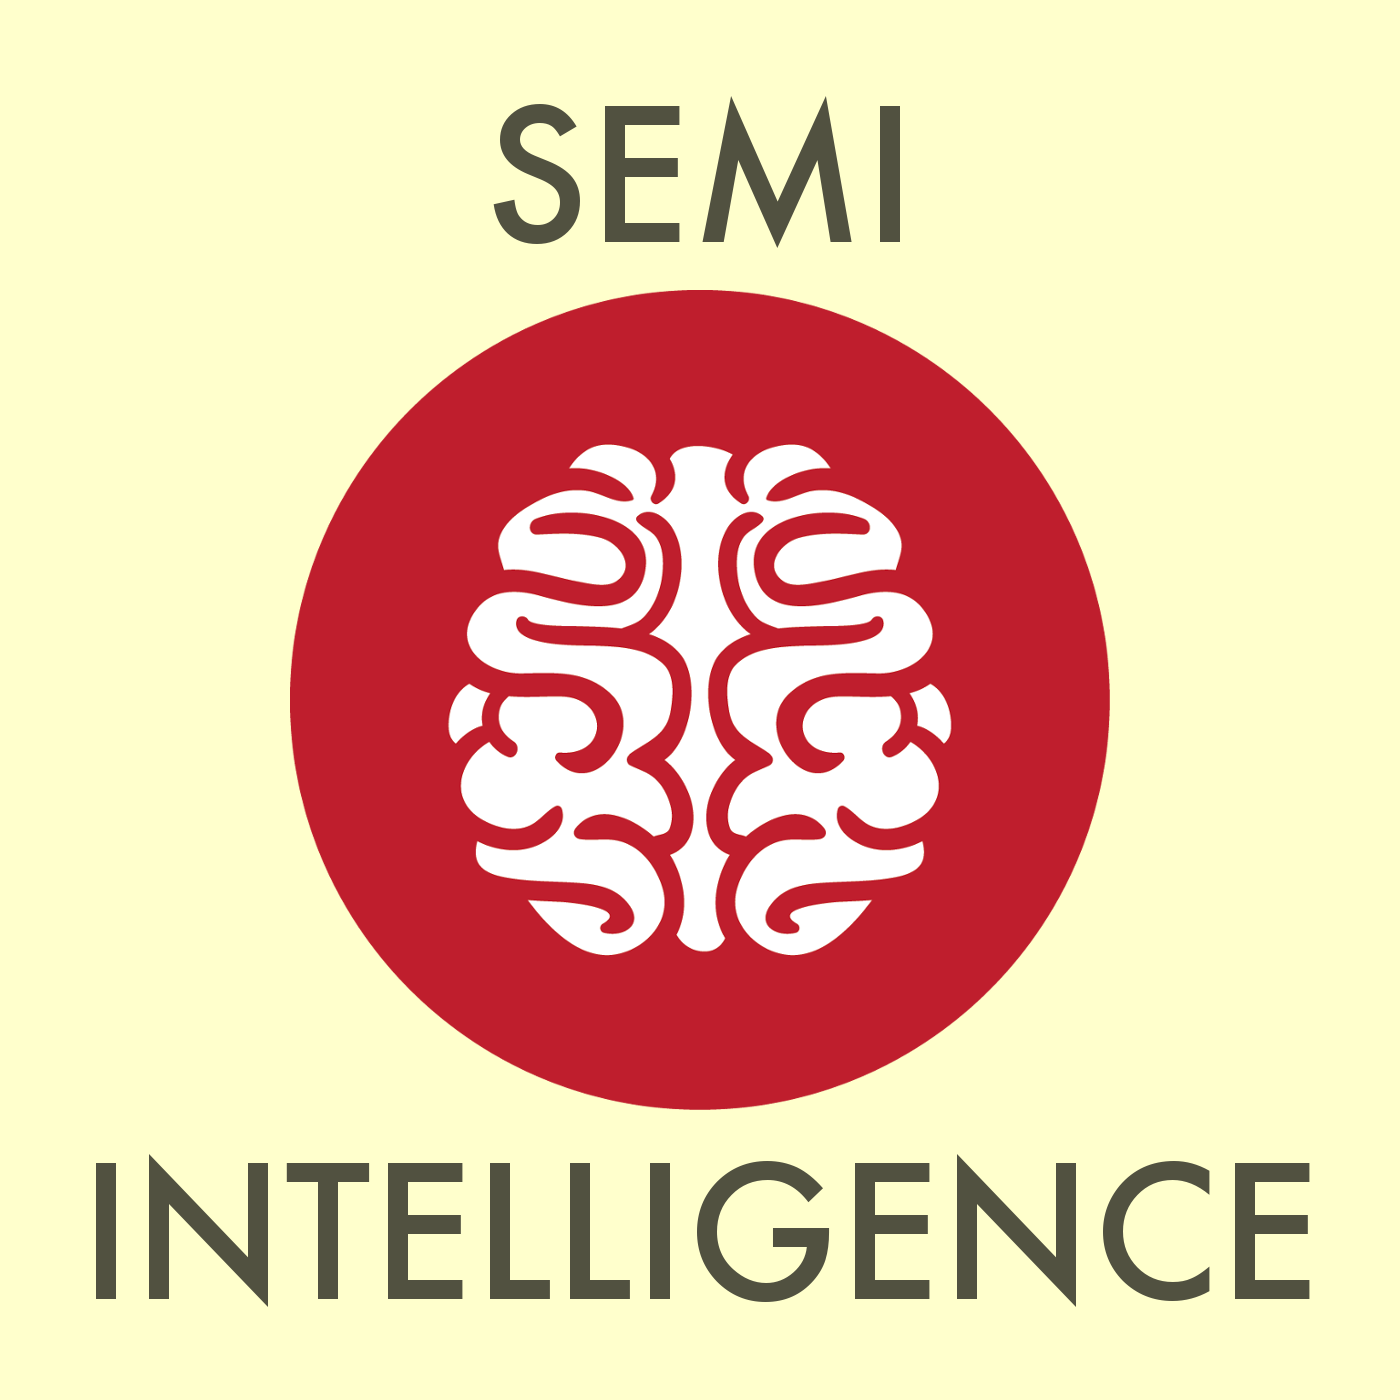 semiintelligence